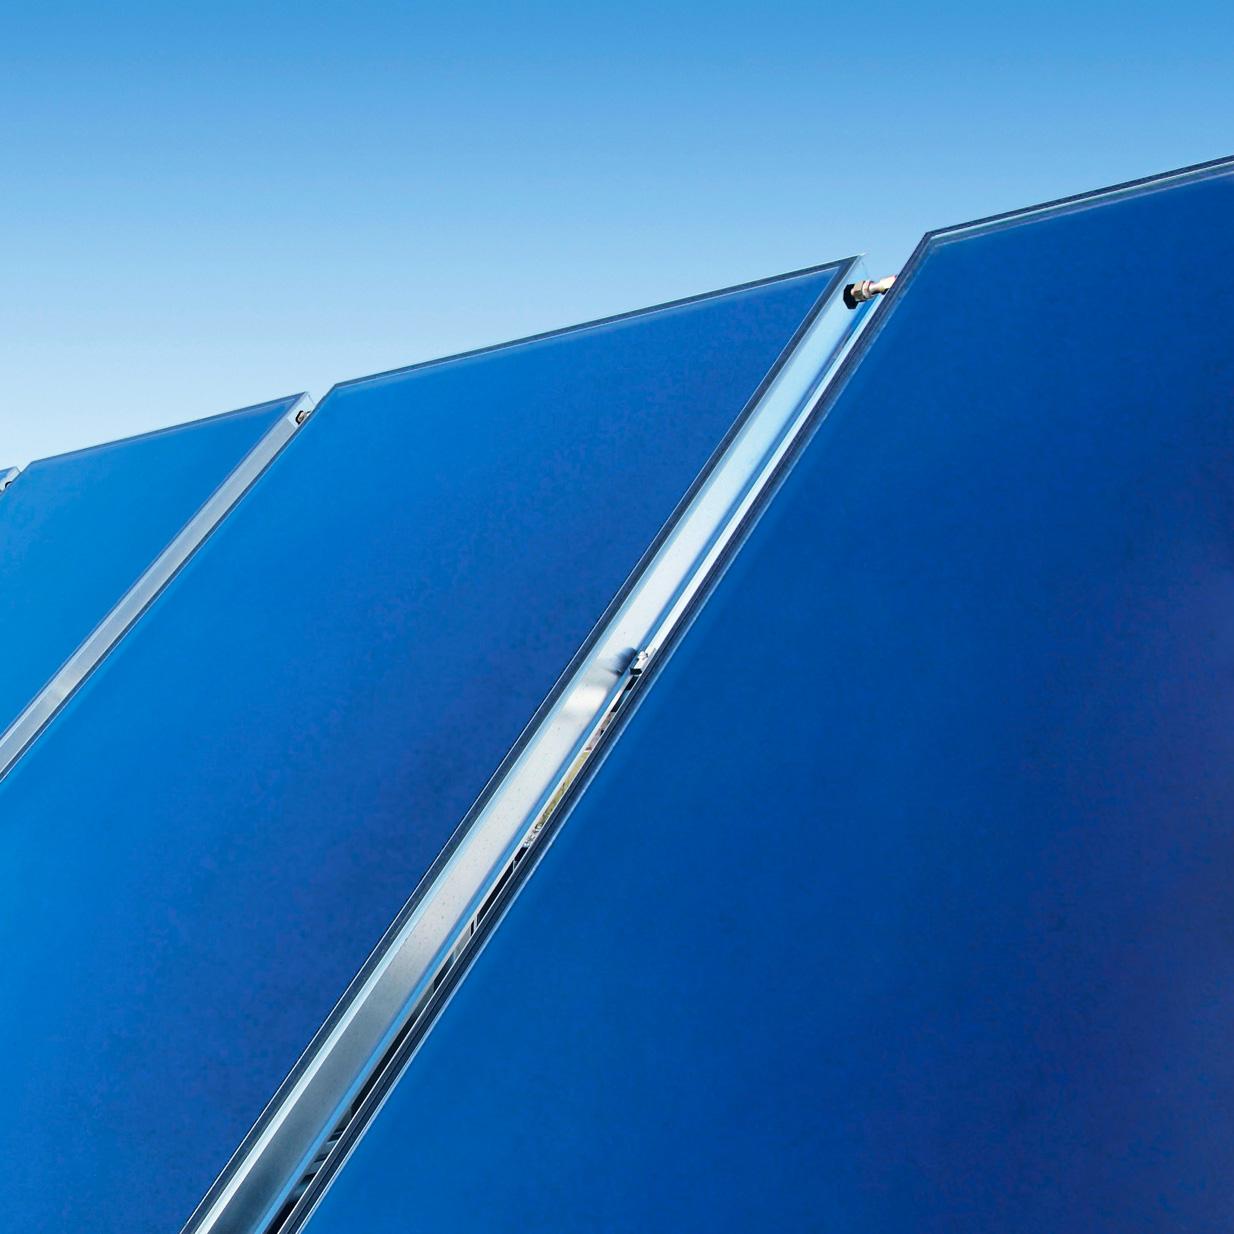 mq15-haustechnik-solar-thermie-flachdach-01-02-marquardt-dillingen